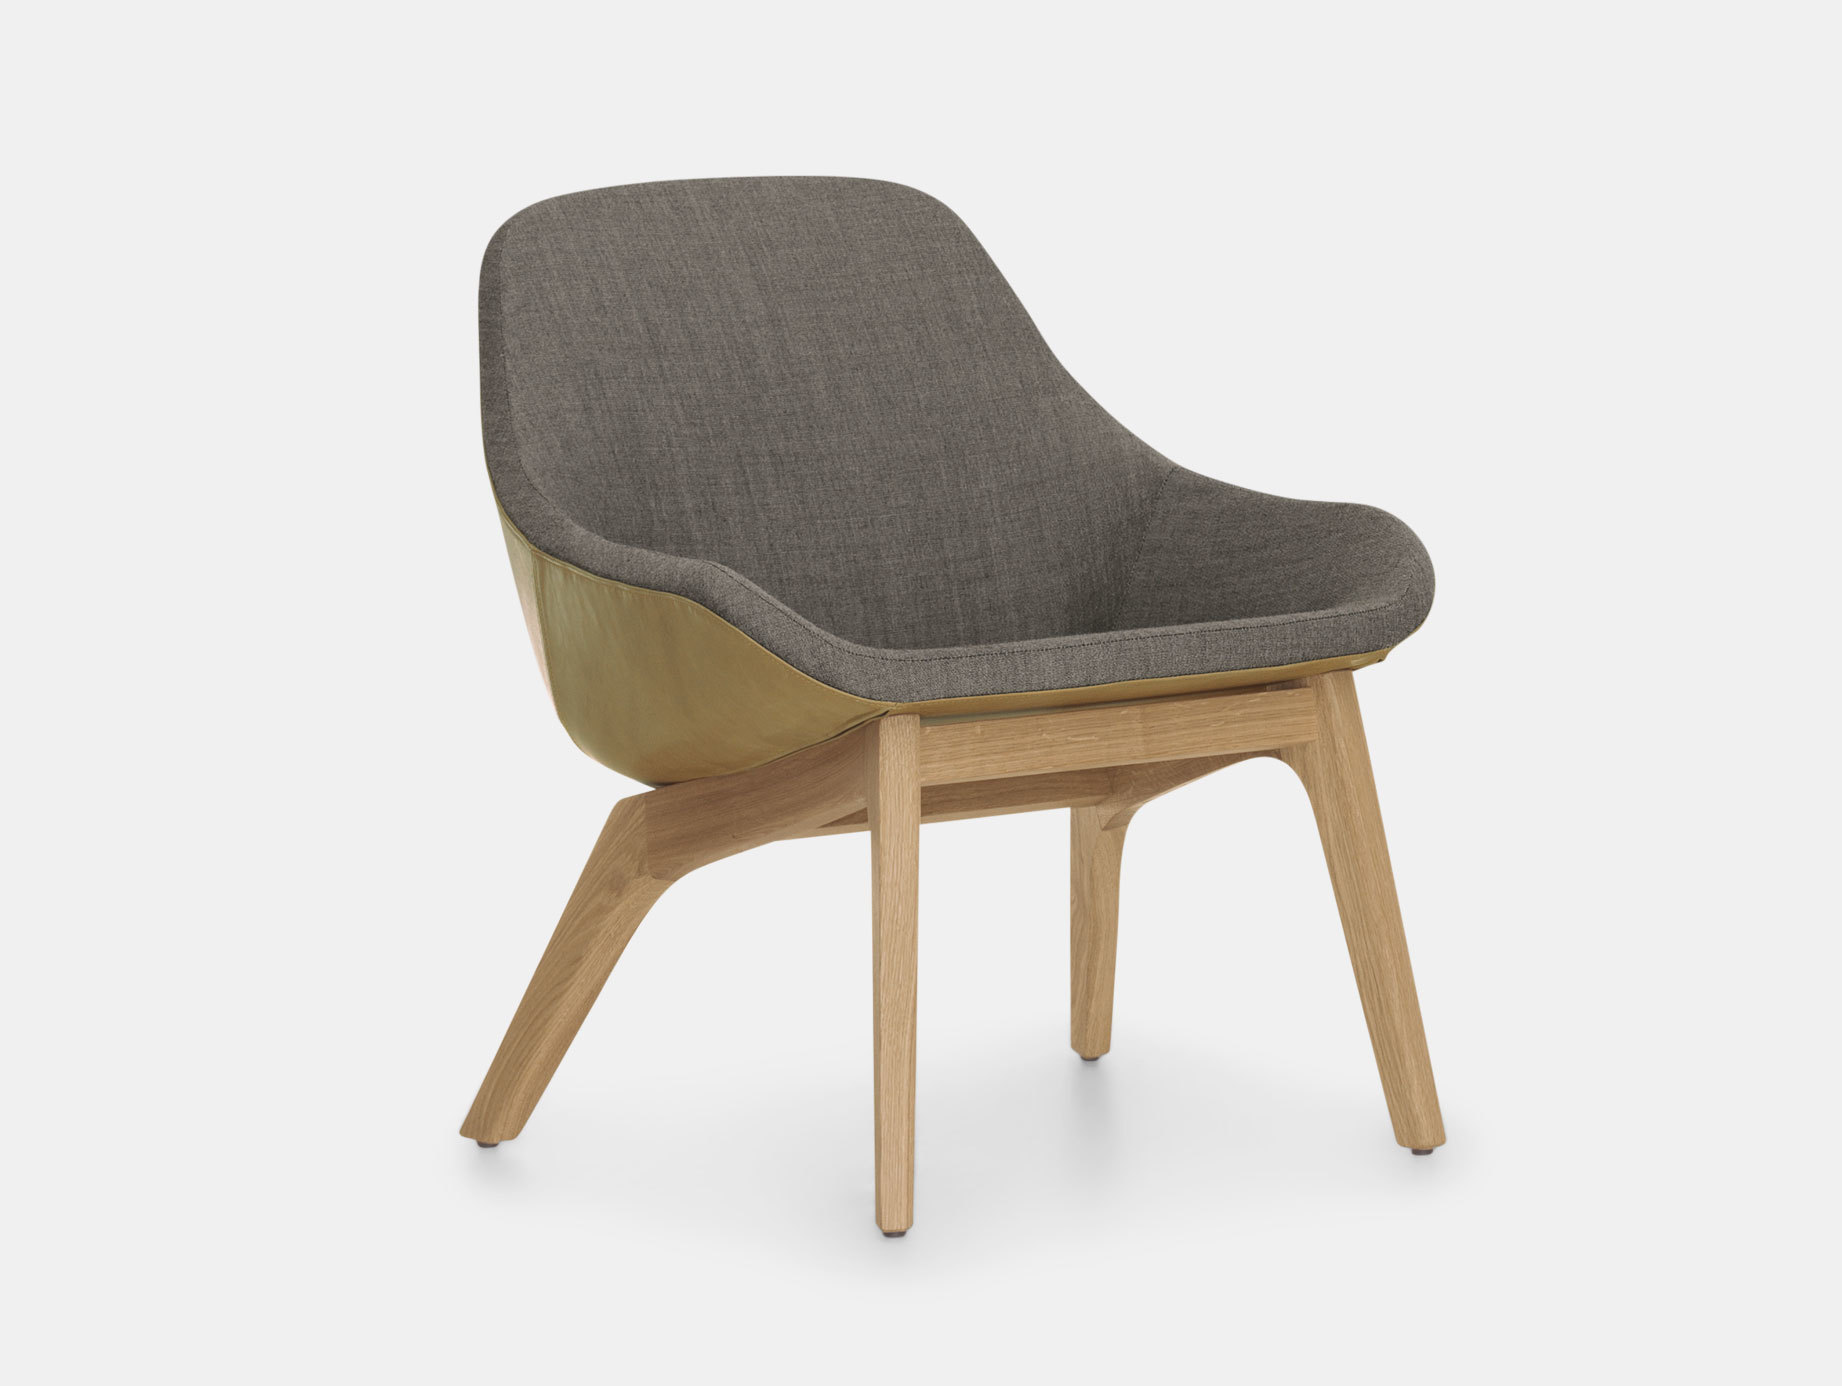 Morph Lounge Chair image 1